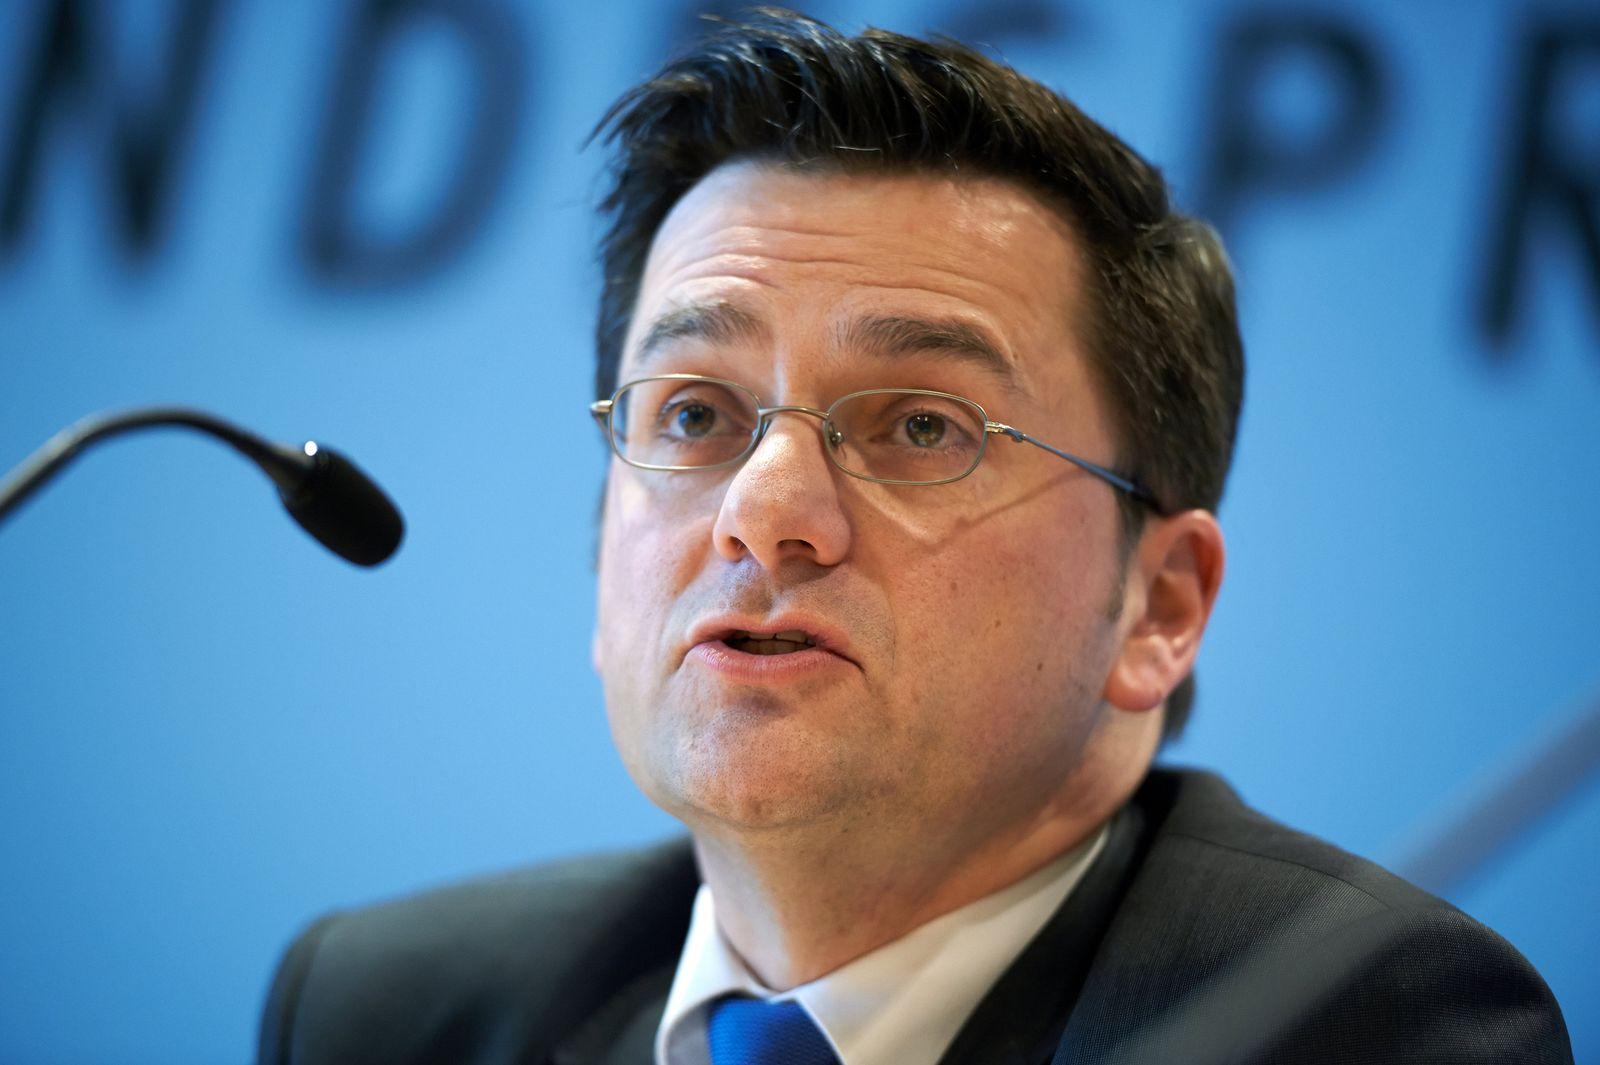 NRW-Justizminister Kutschaty